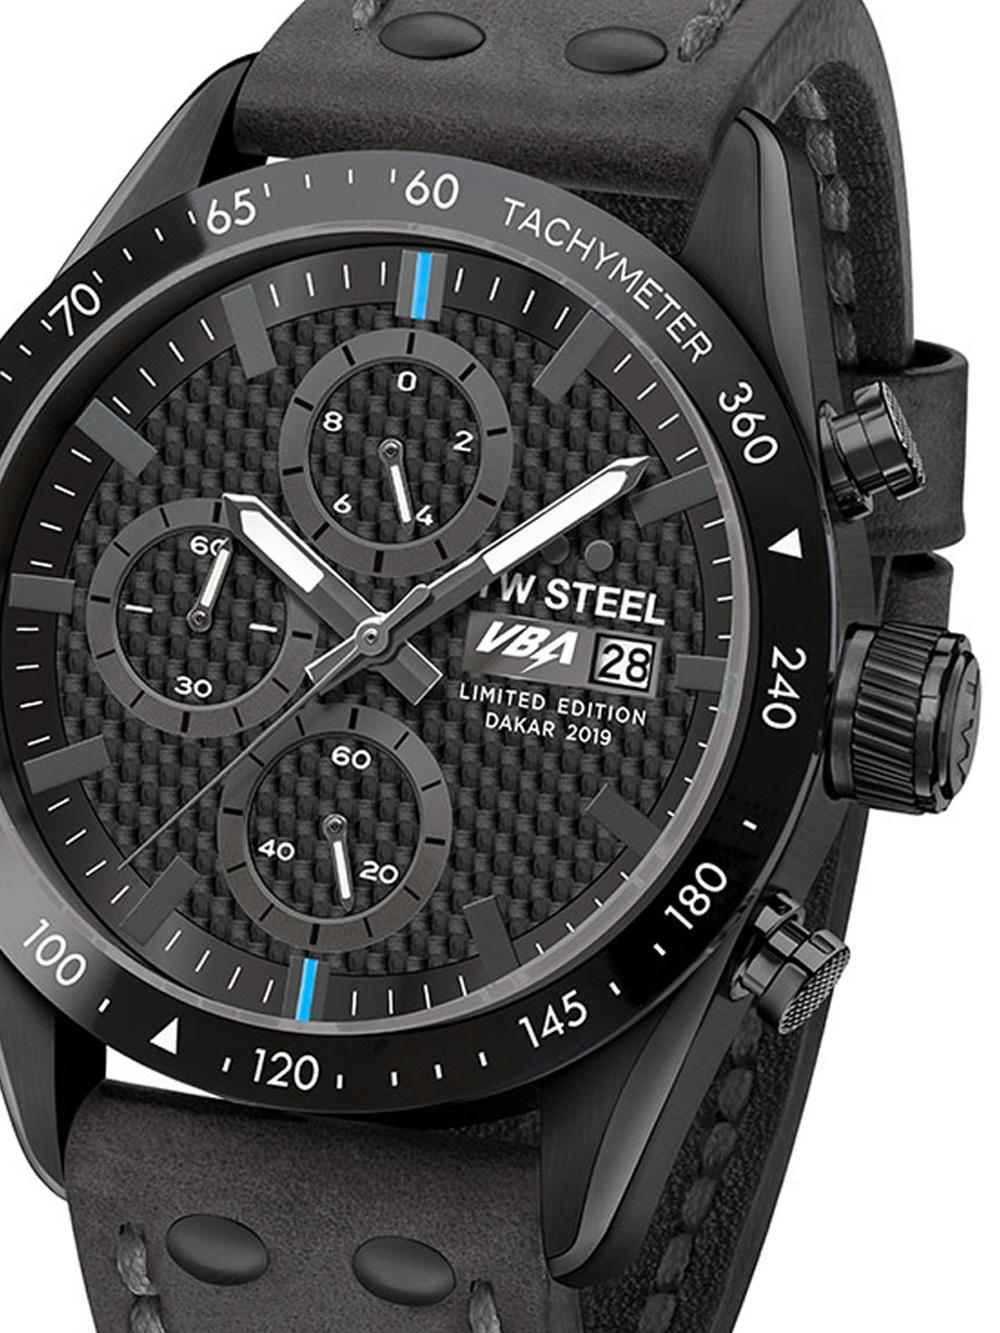 TW997 Dakar Ltd. Chronograph 46mm 10ATM